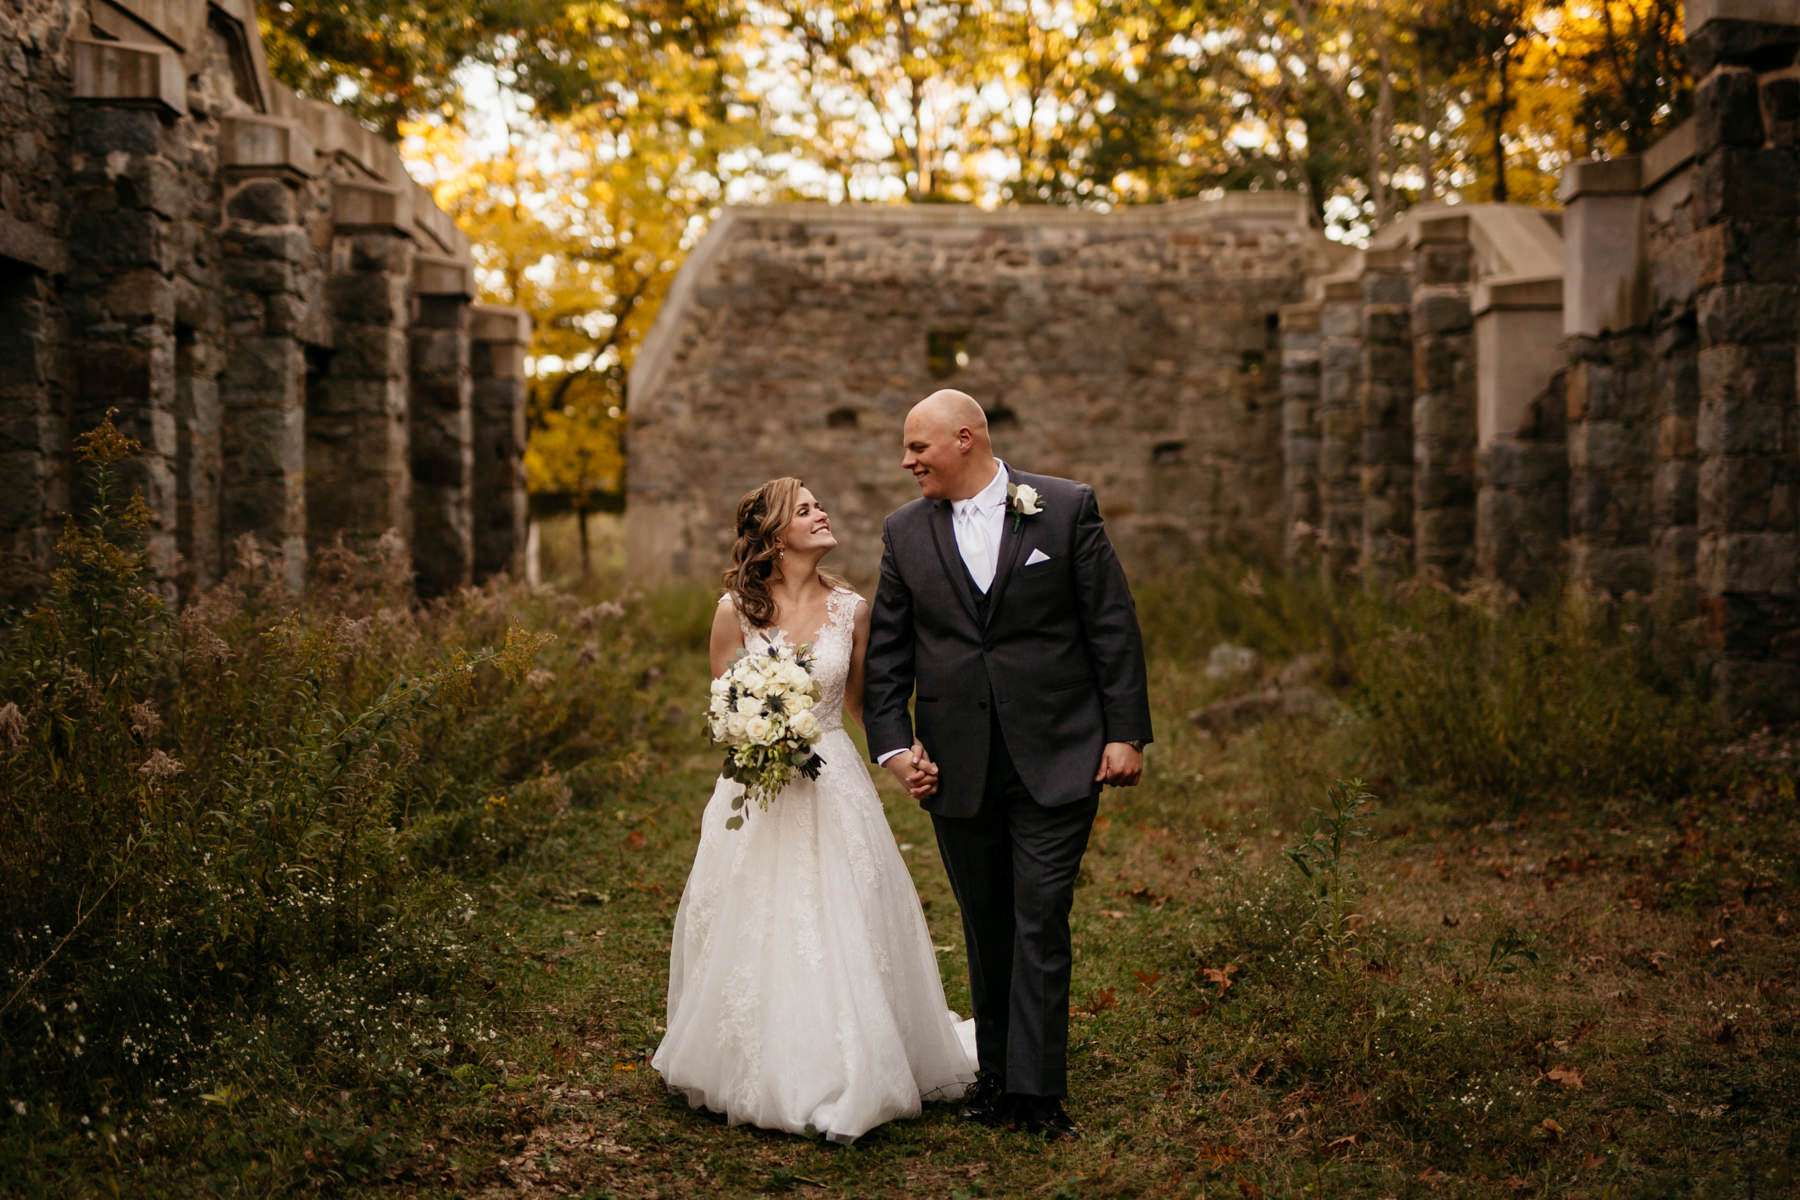 Quincy Ma Massachusetts Wedding Dedham Boston Granie Links Wedding New England Catholic Cathedral Liz Osban Photography 71.jpg